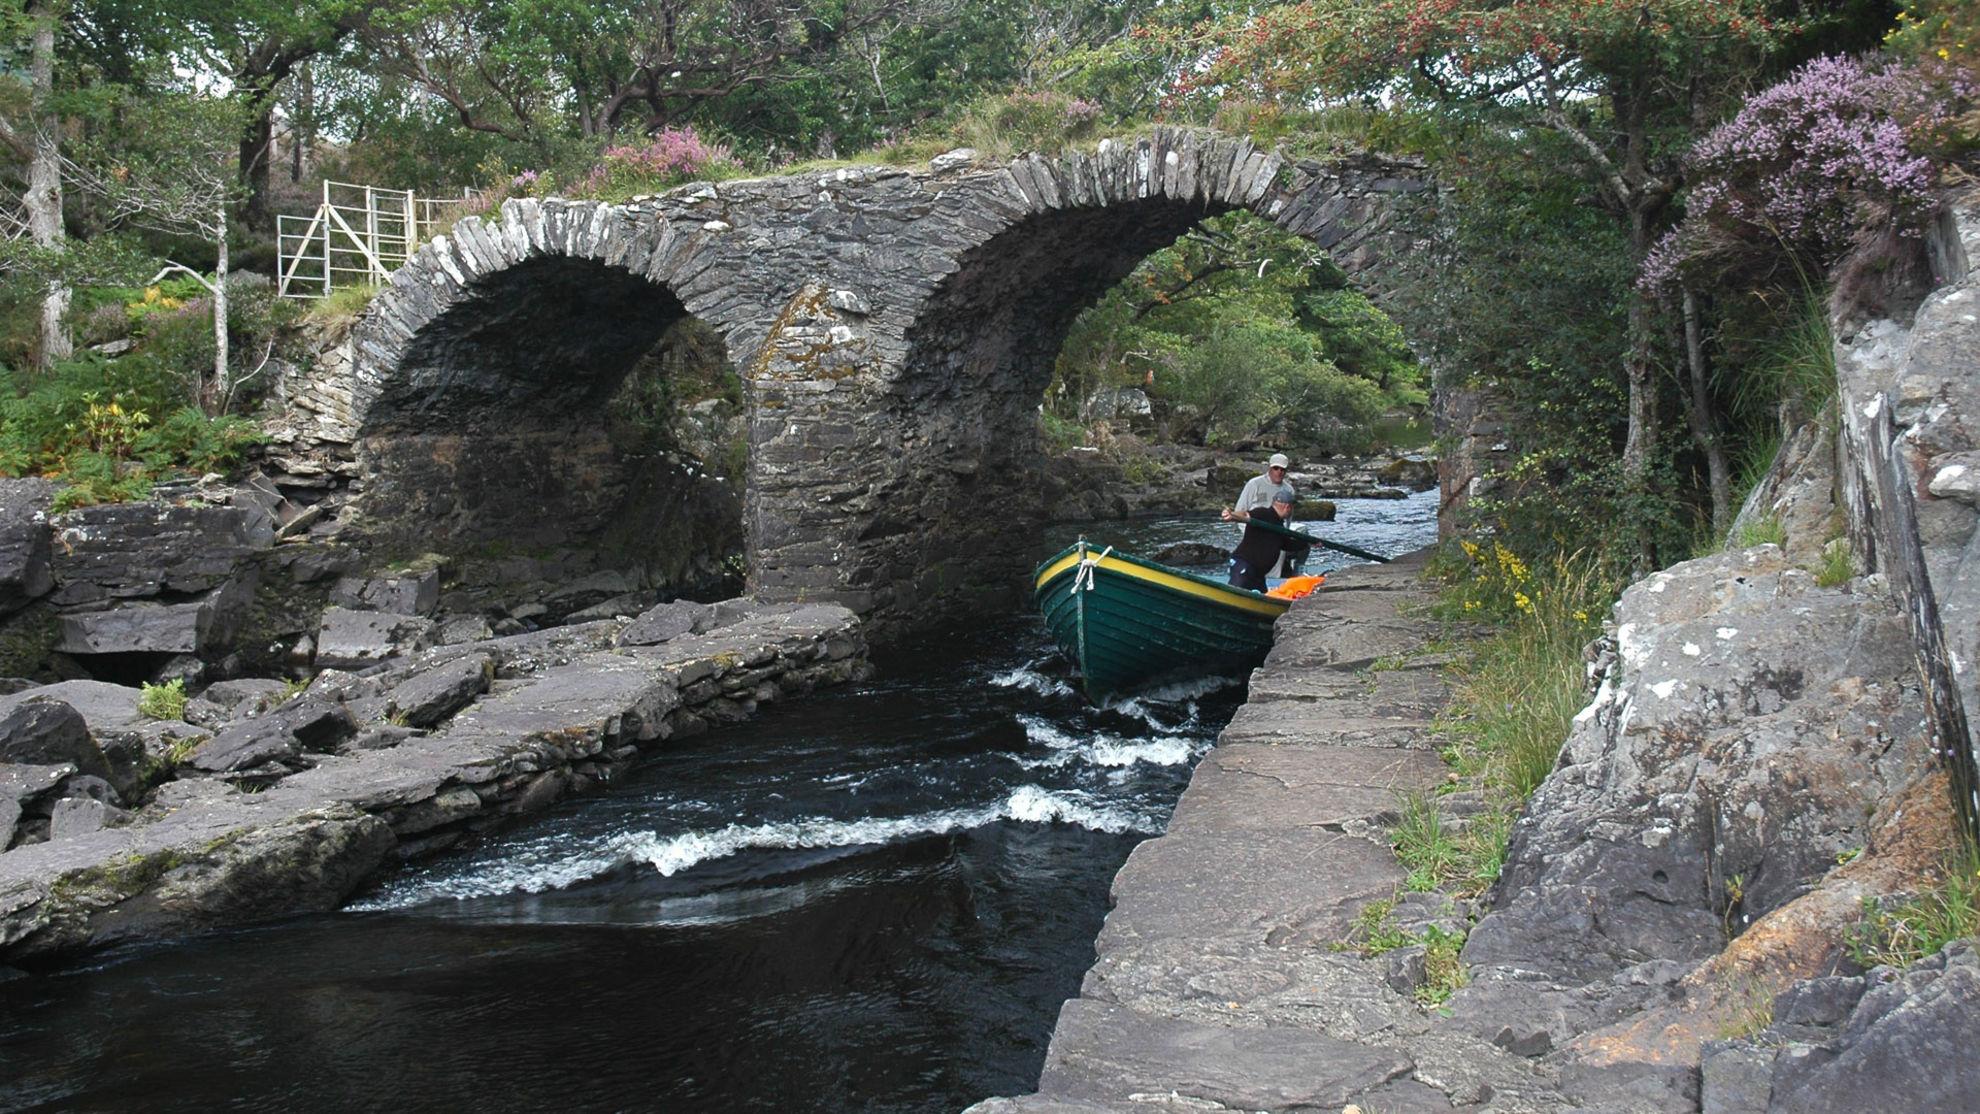 Boating & Fishing in Killarney, Ireland | The Europe Hotel